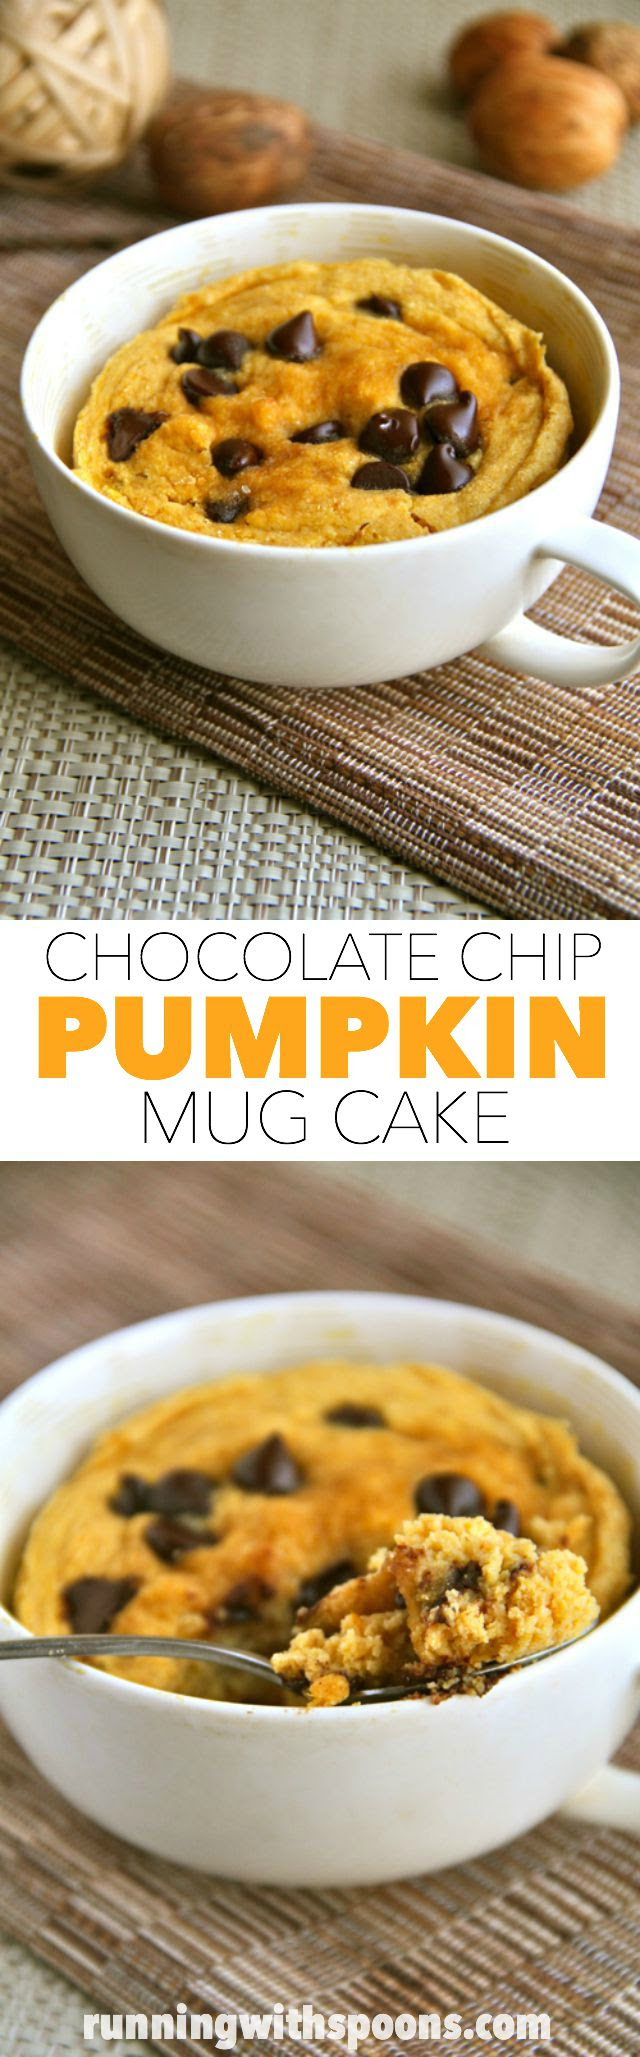 chocolate chip pumpkin mug cake . - . running with spoons